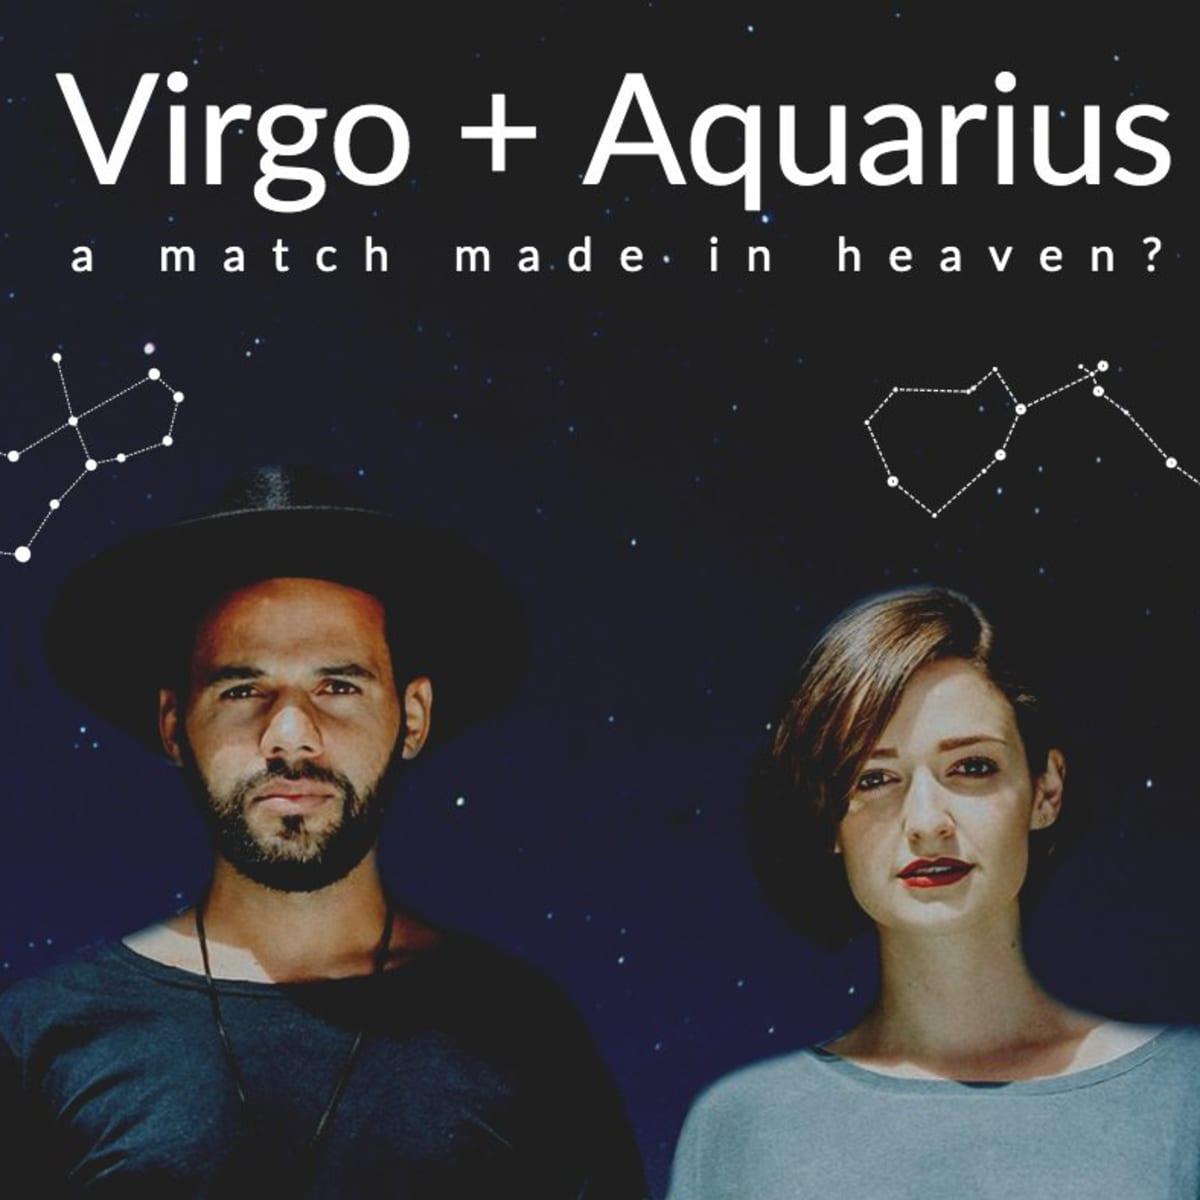 Are aquarians and virgos compatible